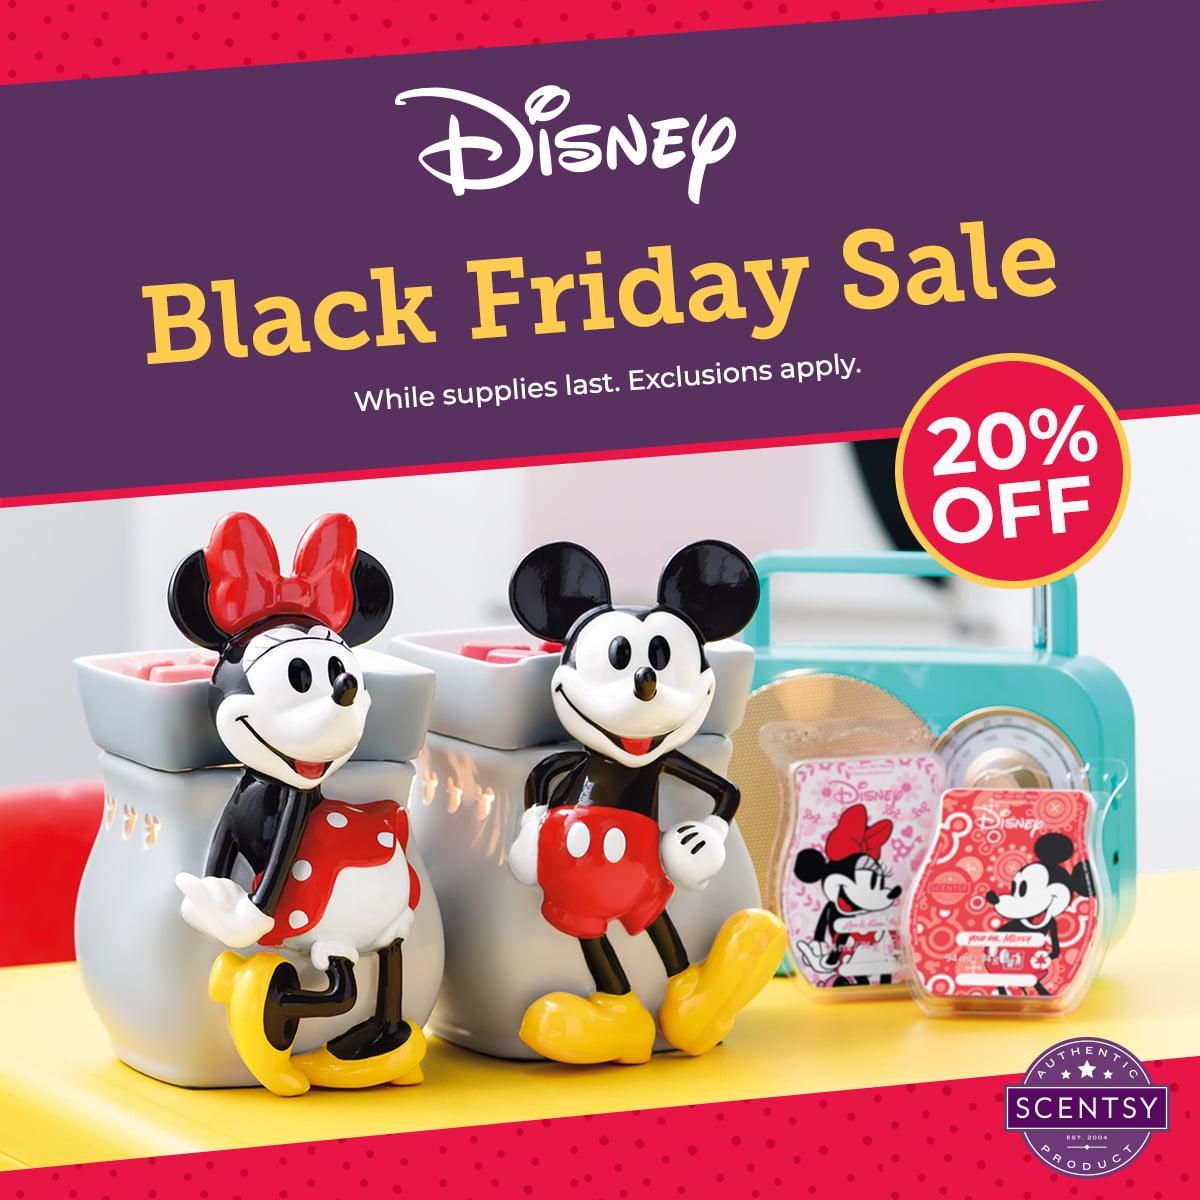 Disney Black Friday Sale